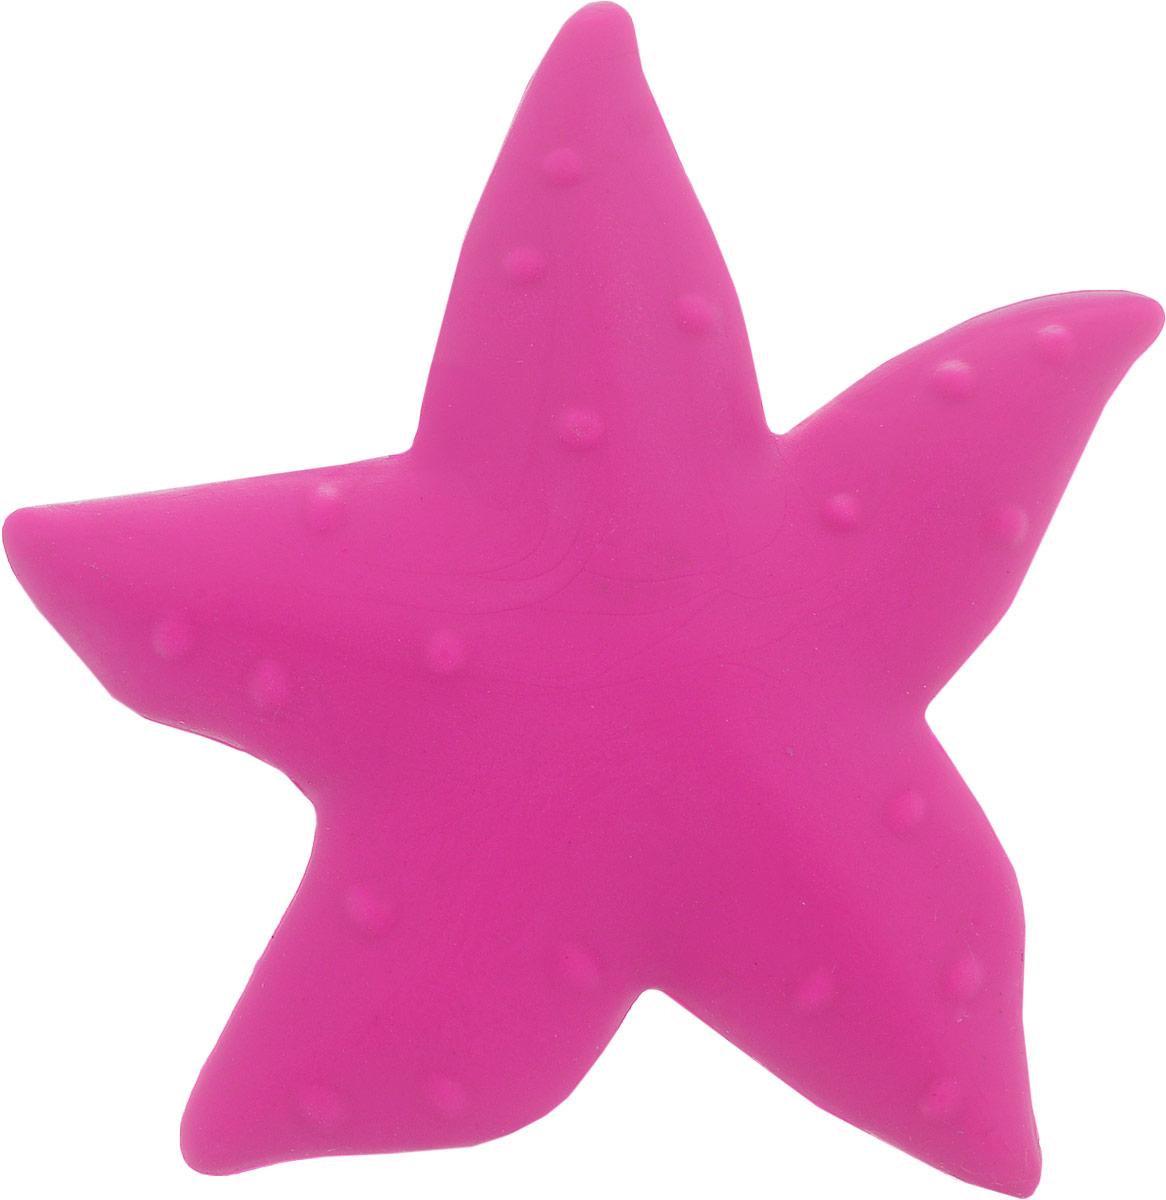 Brunnen Ластик Обитатели моря Звезда цвет розовый 29968-26\BCD_розовый/звезда